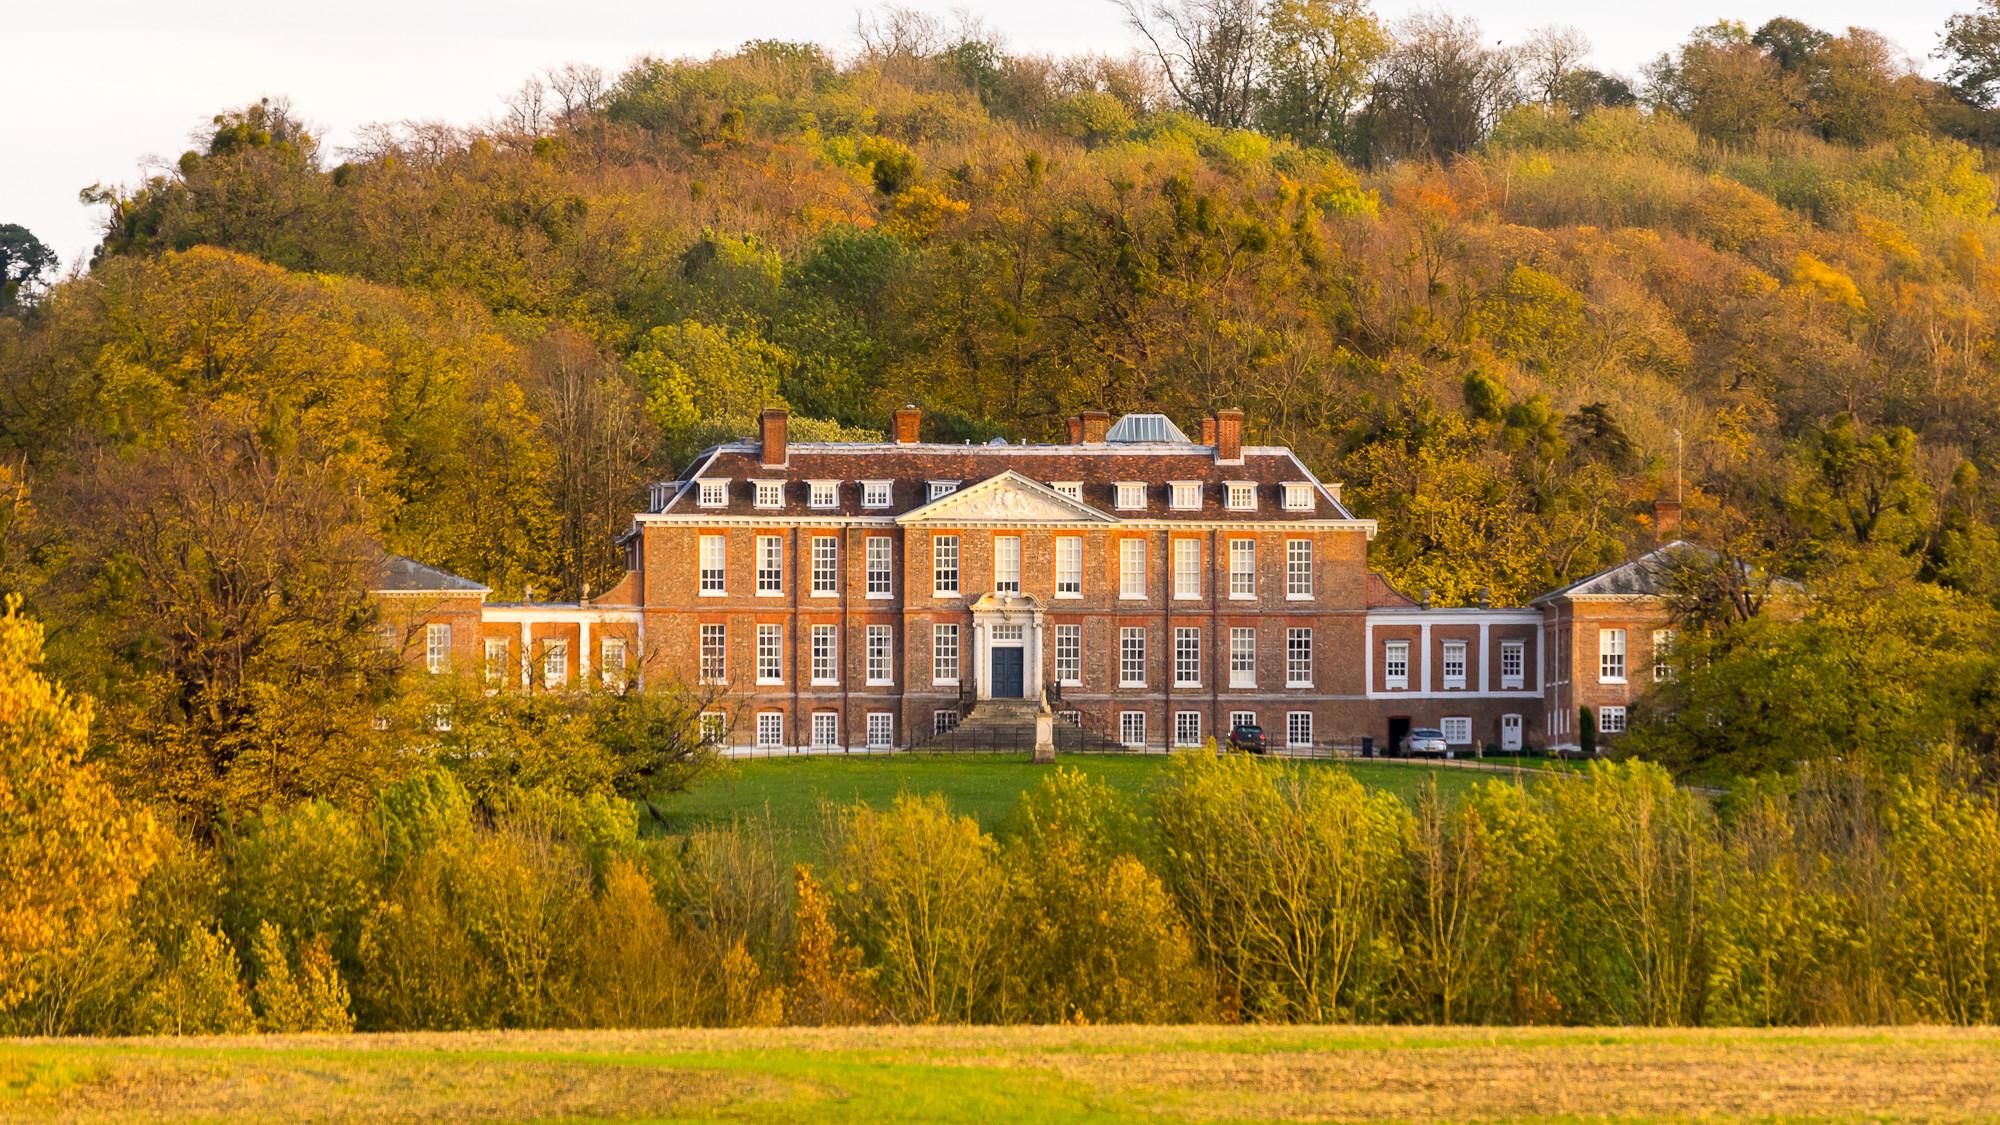 Ampthill Park House, Bedfordshire 2 by Ken Barley.jpg